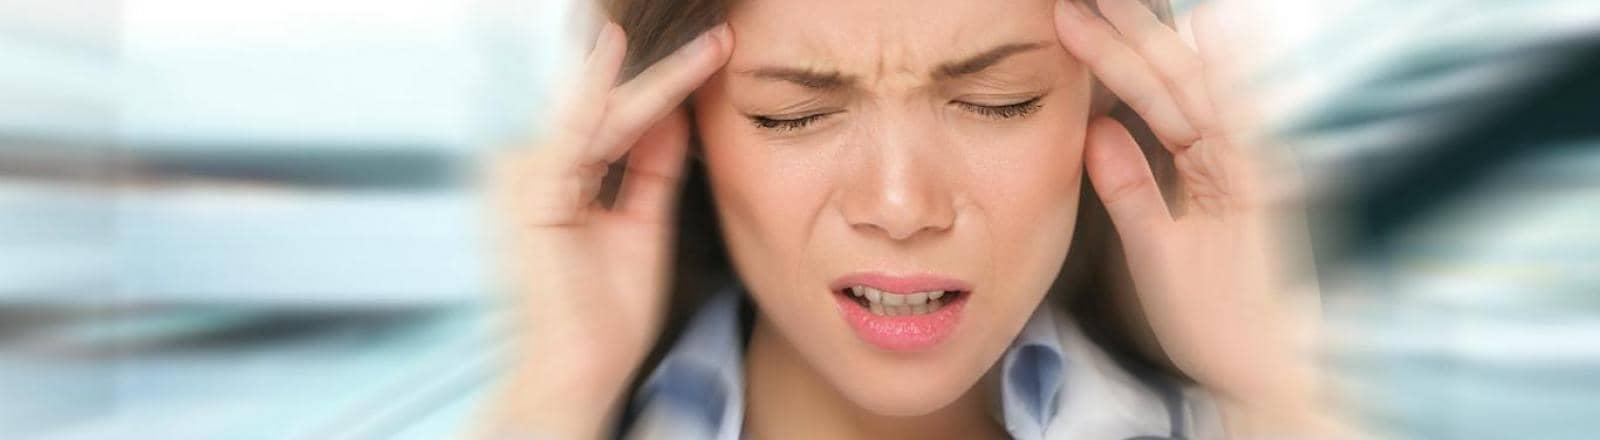 cefálea, dolor de cabeza y neuralgia de arnold